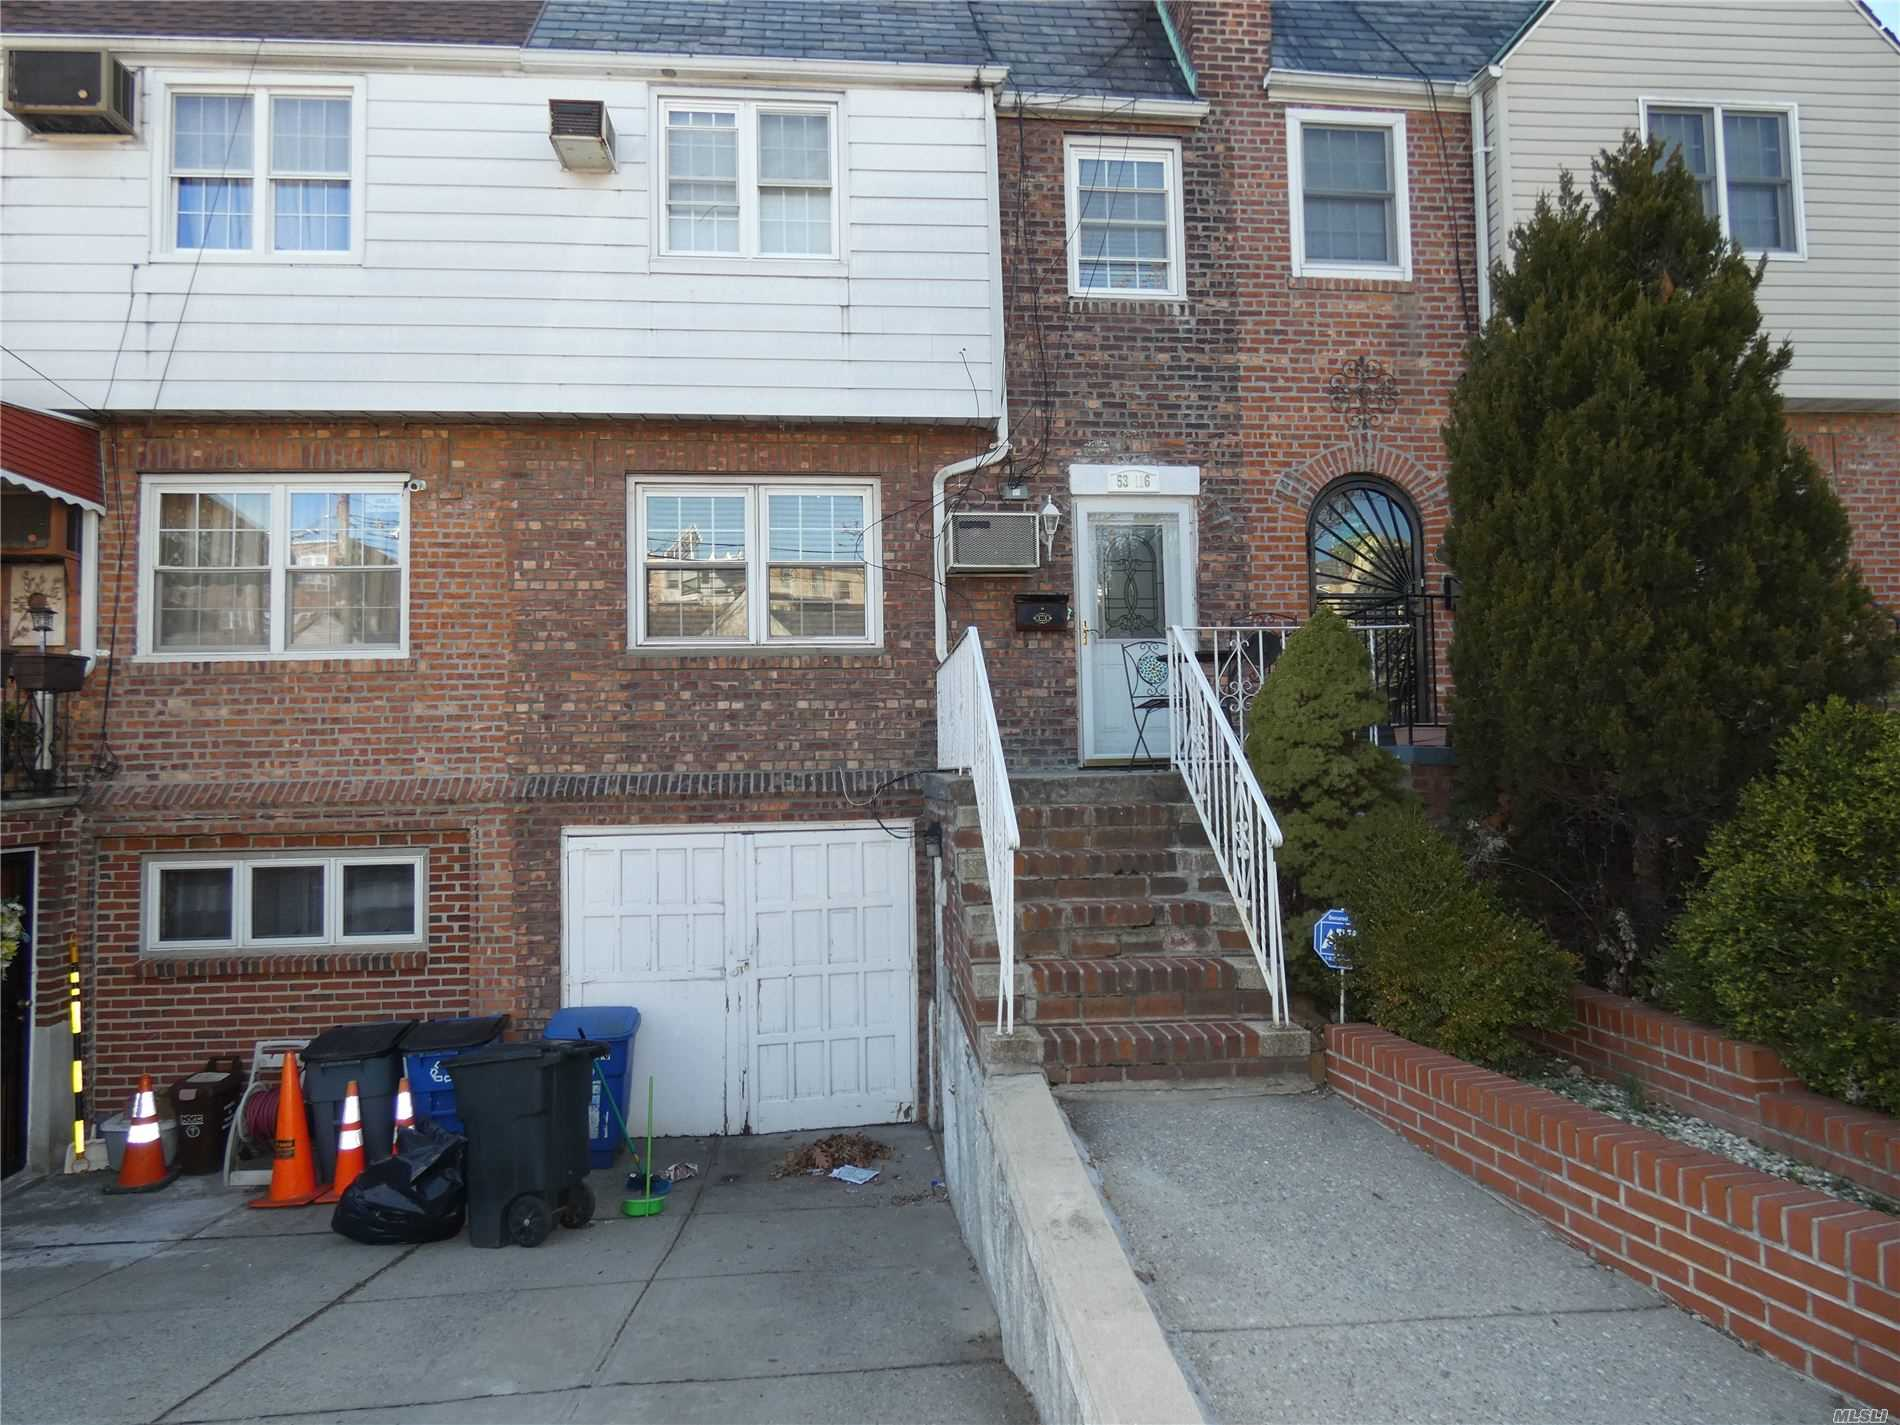 Property for sale at 53-116 S 63 Street, Maspeth NY 11378, Maspeth,  New York 11378